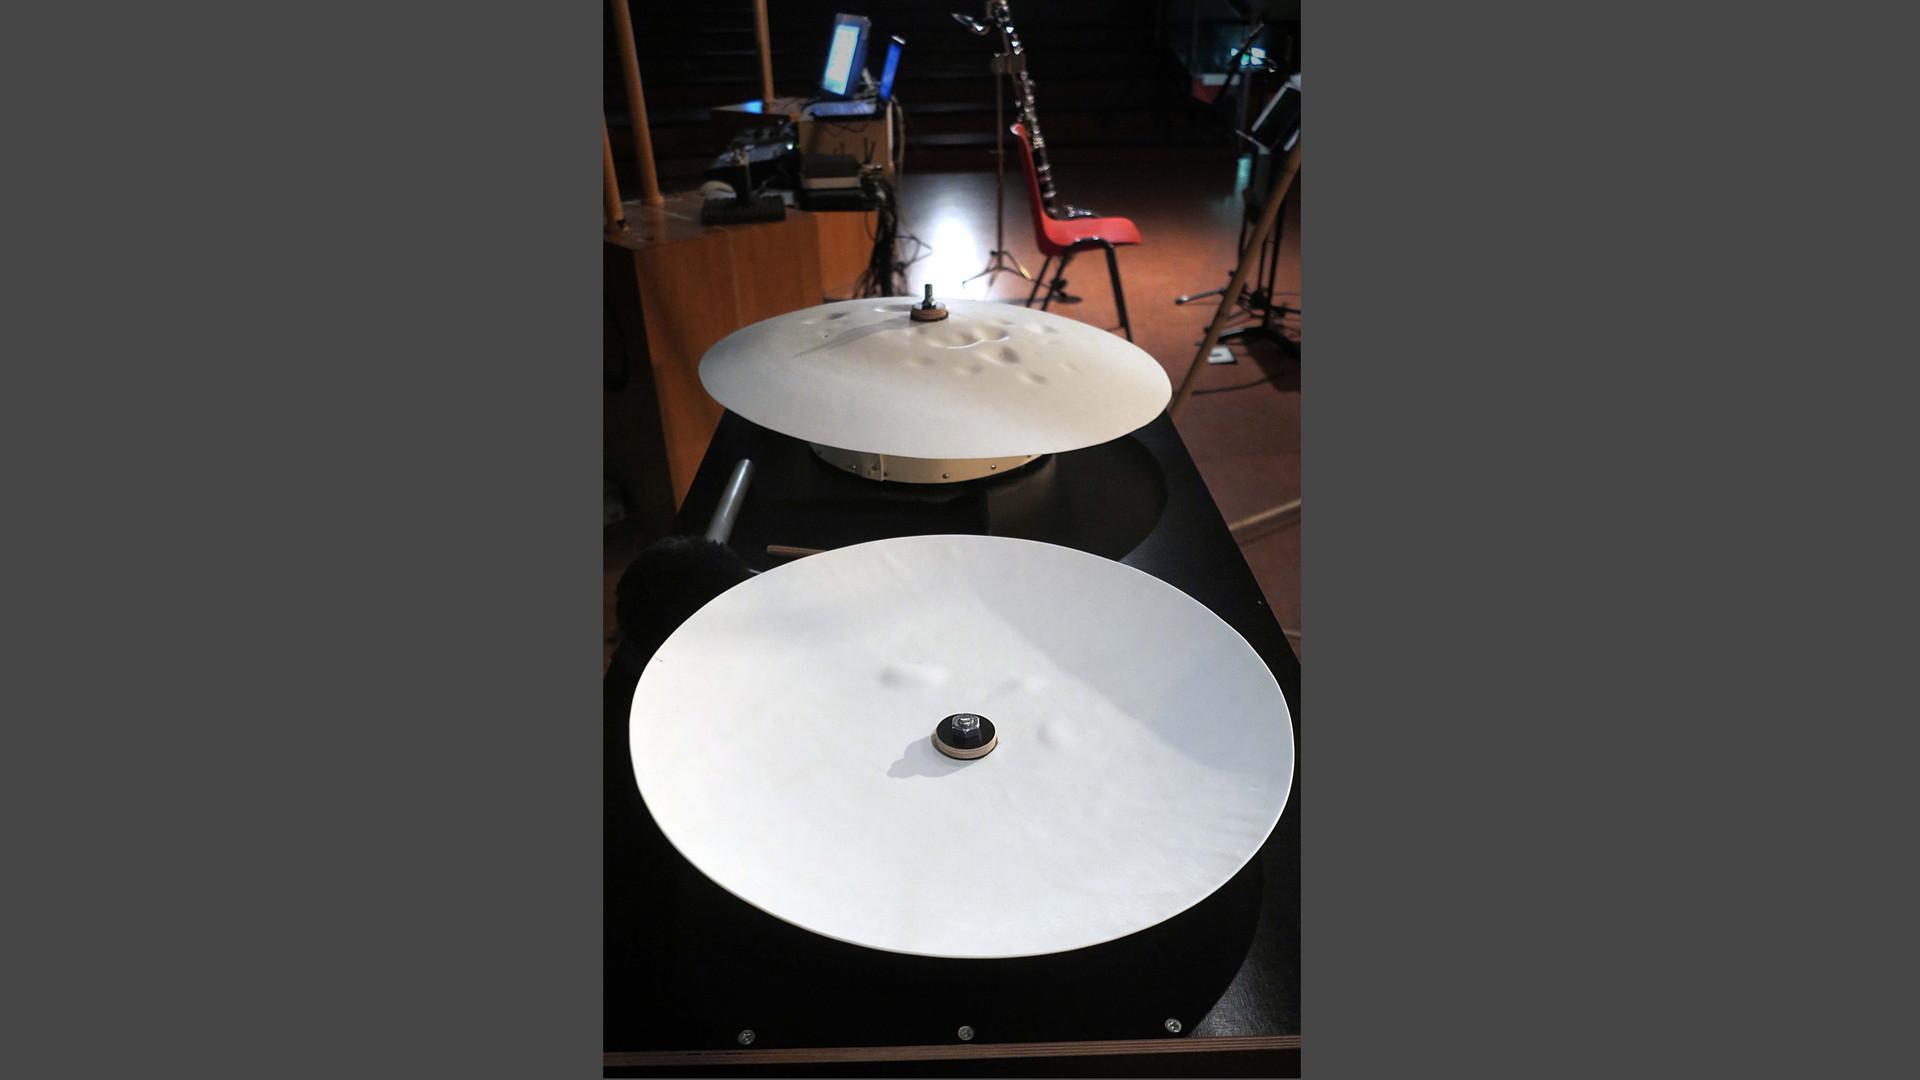 Thin bowls for 'Sounding Porcelain', Ste